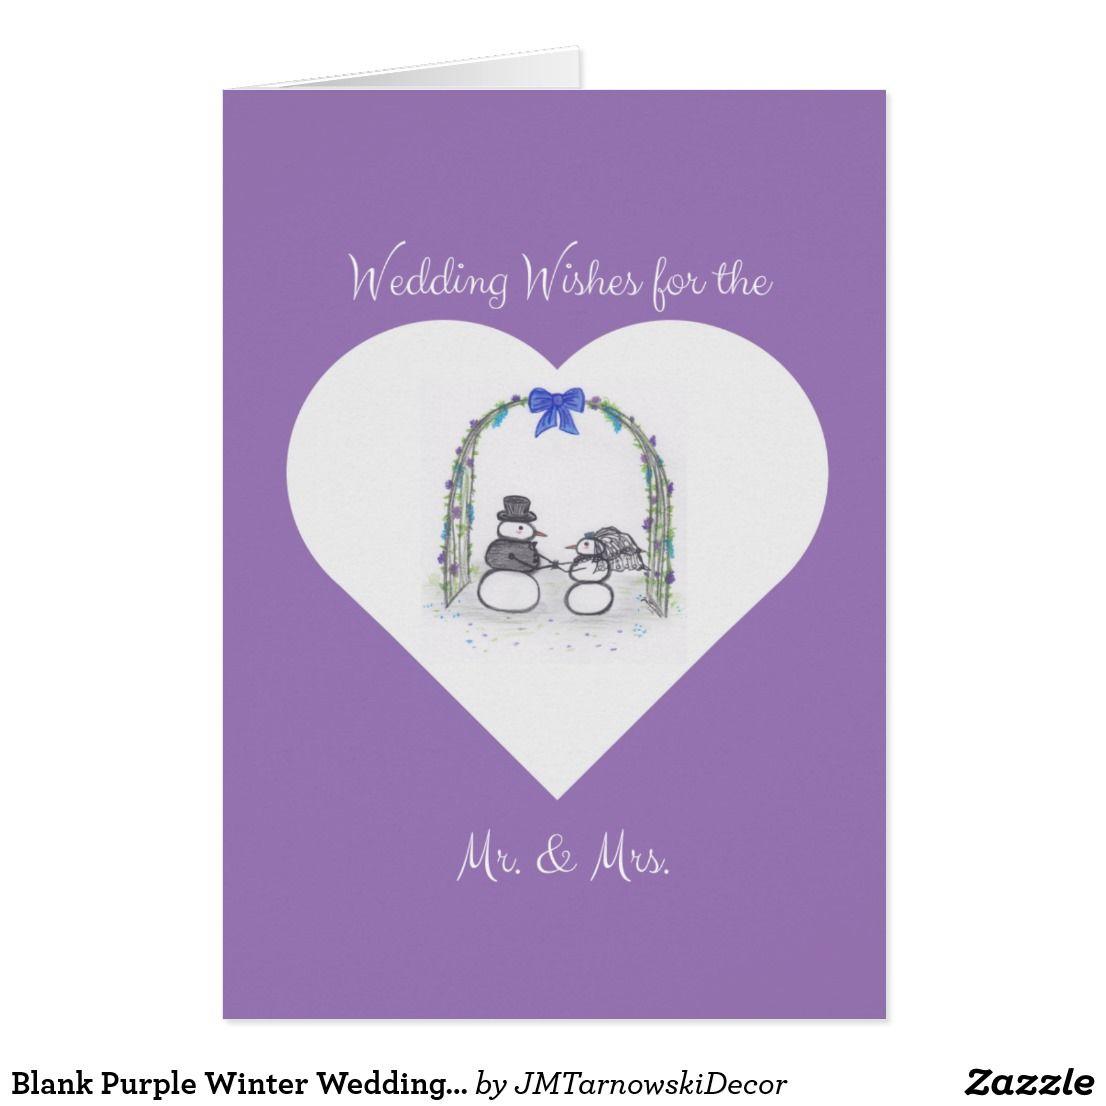 Blank Purple Winter Wedding Wishes Greeting Card Purple Winter